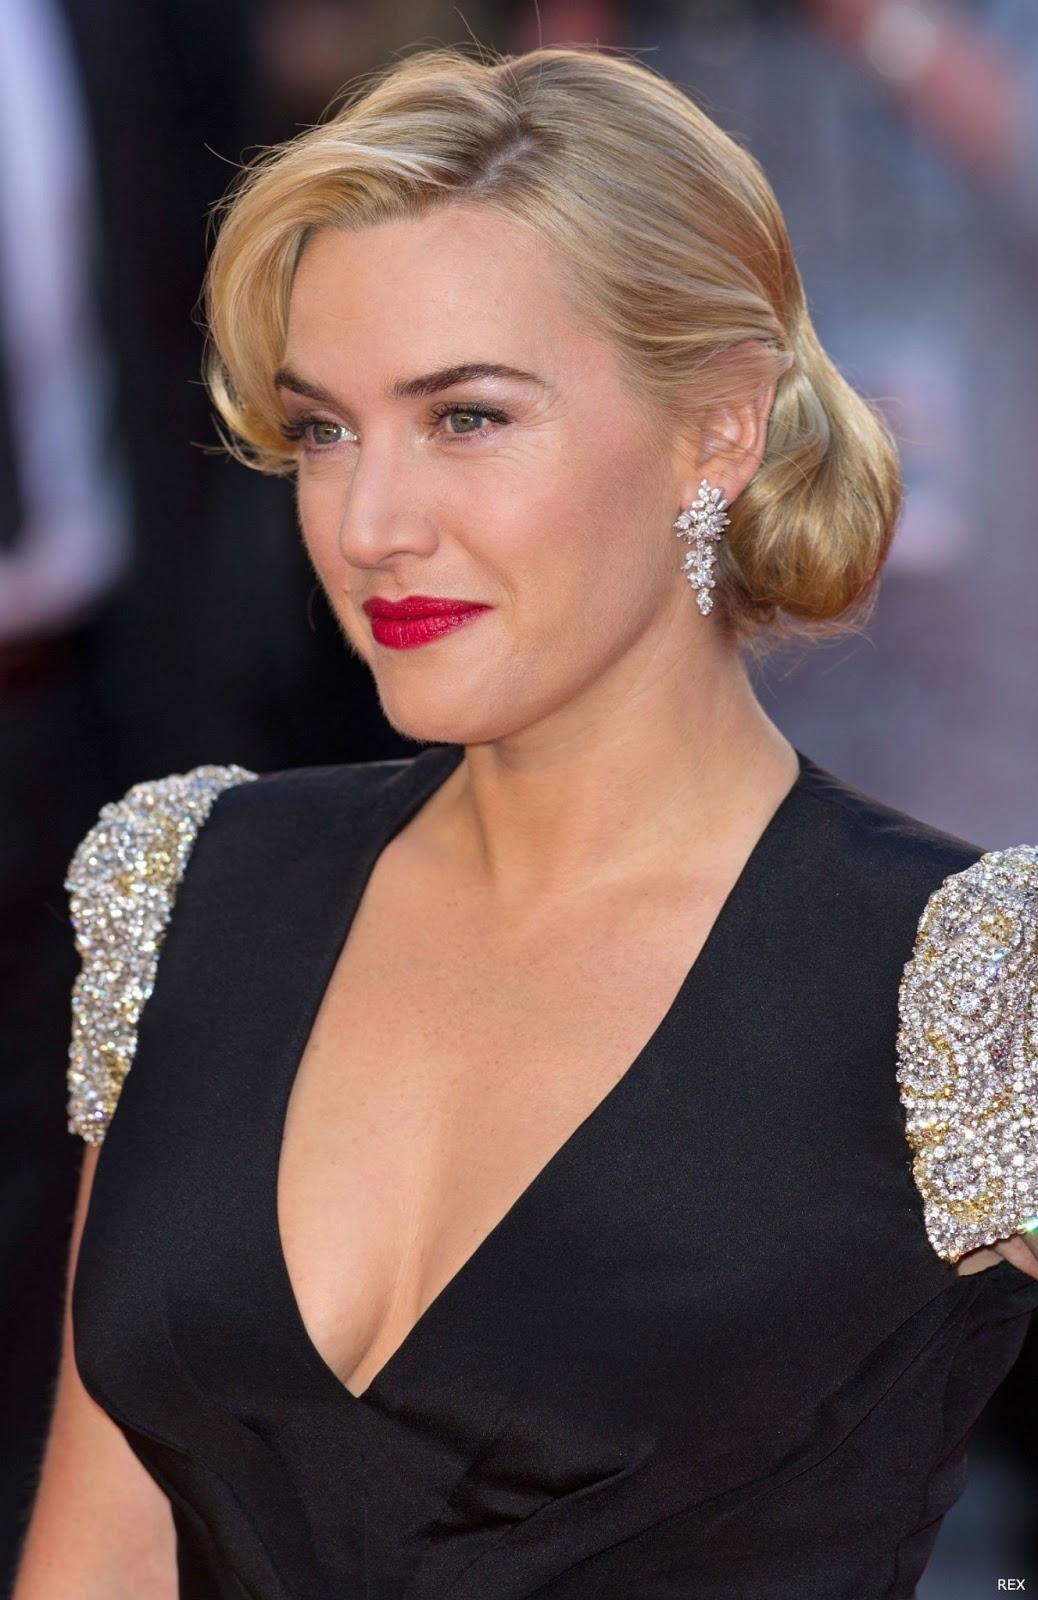 Kate Winslet Kate Winslet Hairstyles